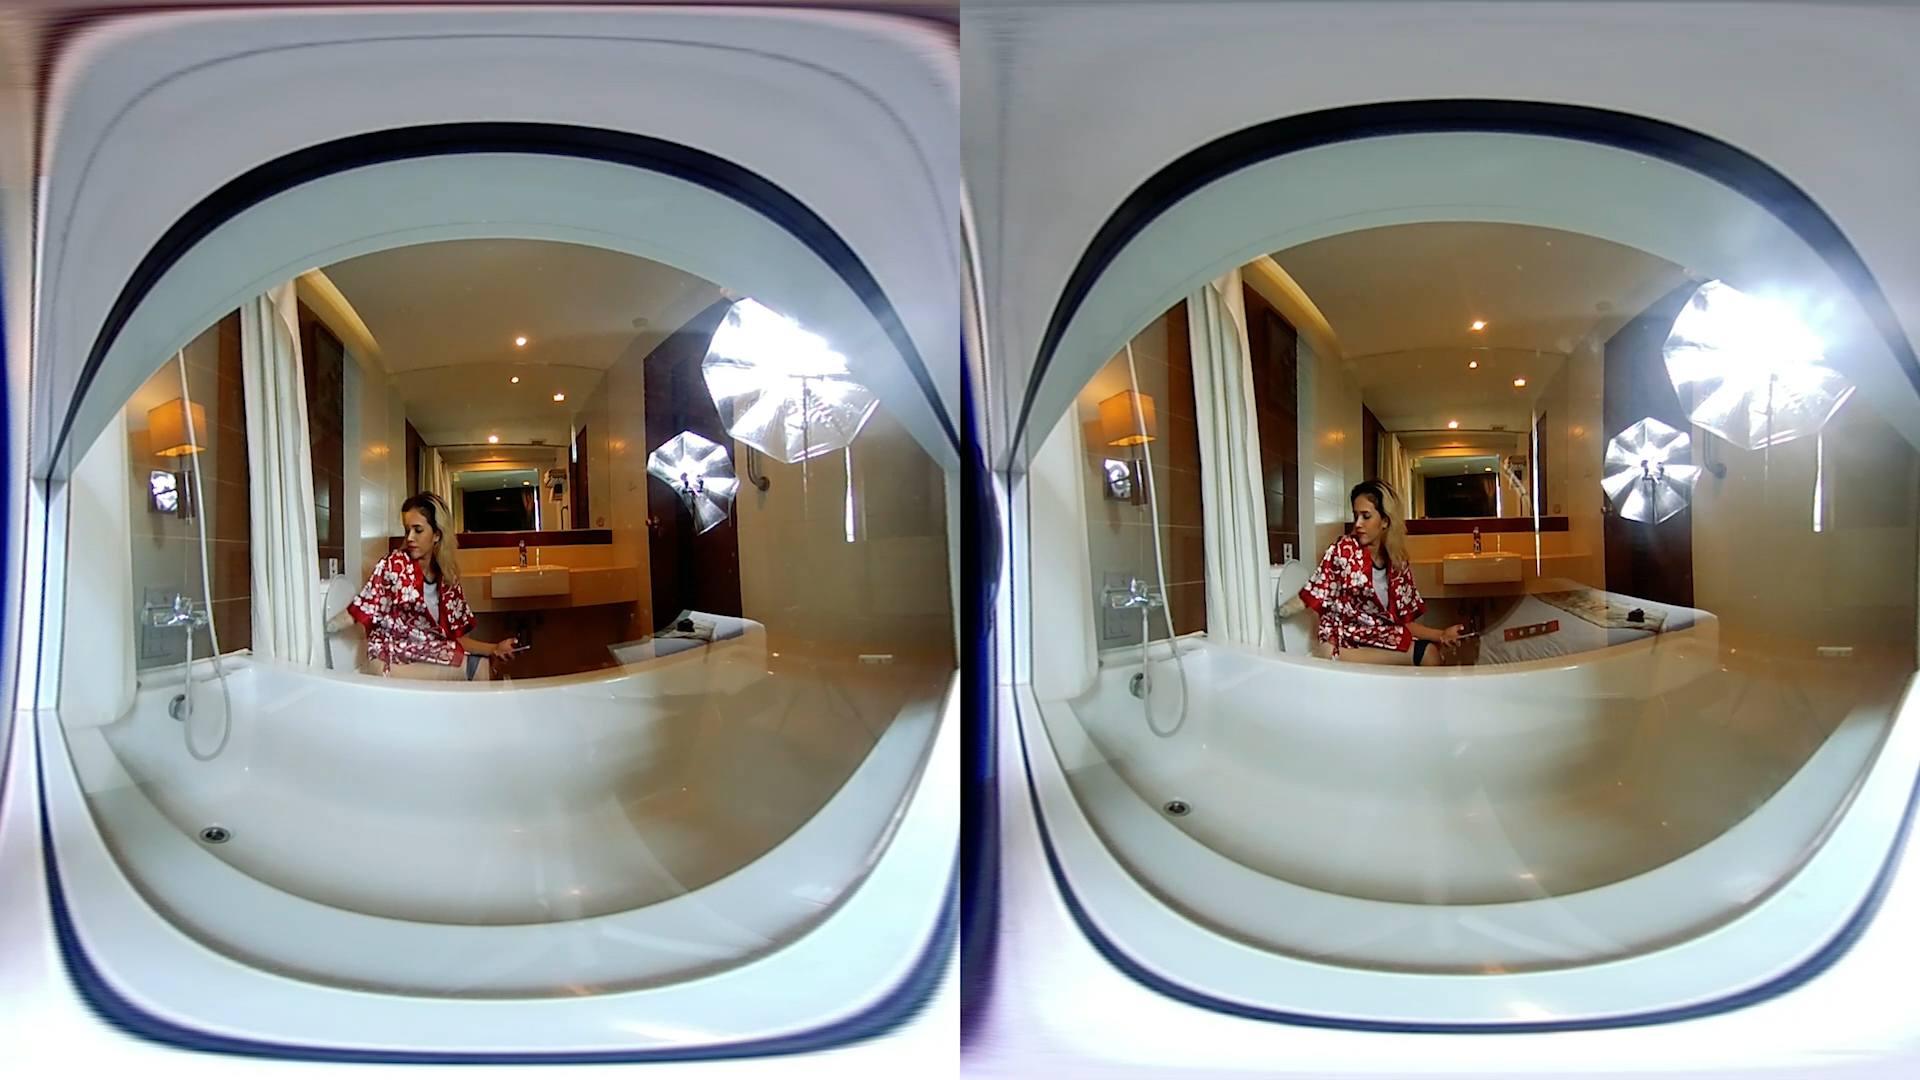 Toilet And Bathroom Voyeur  VR Porn Video  VRPorncom